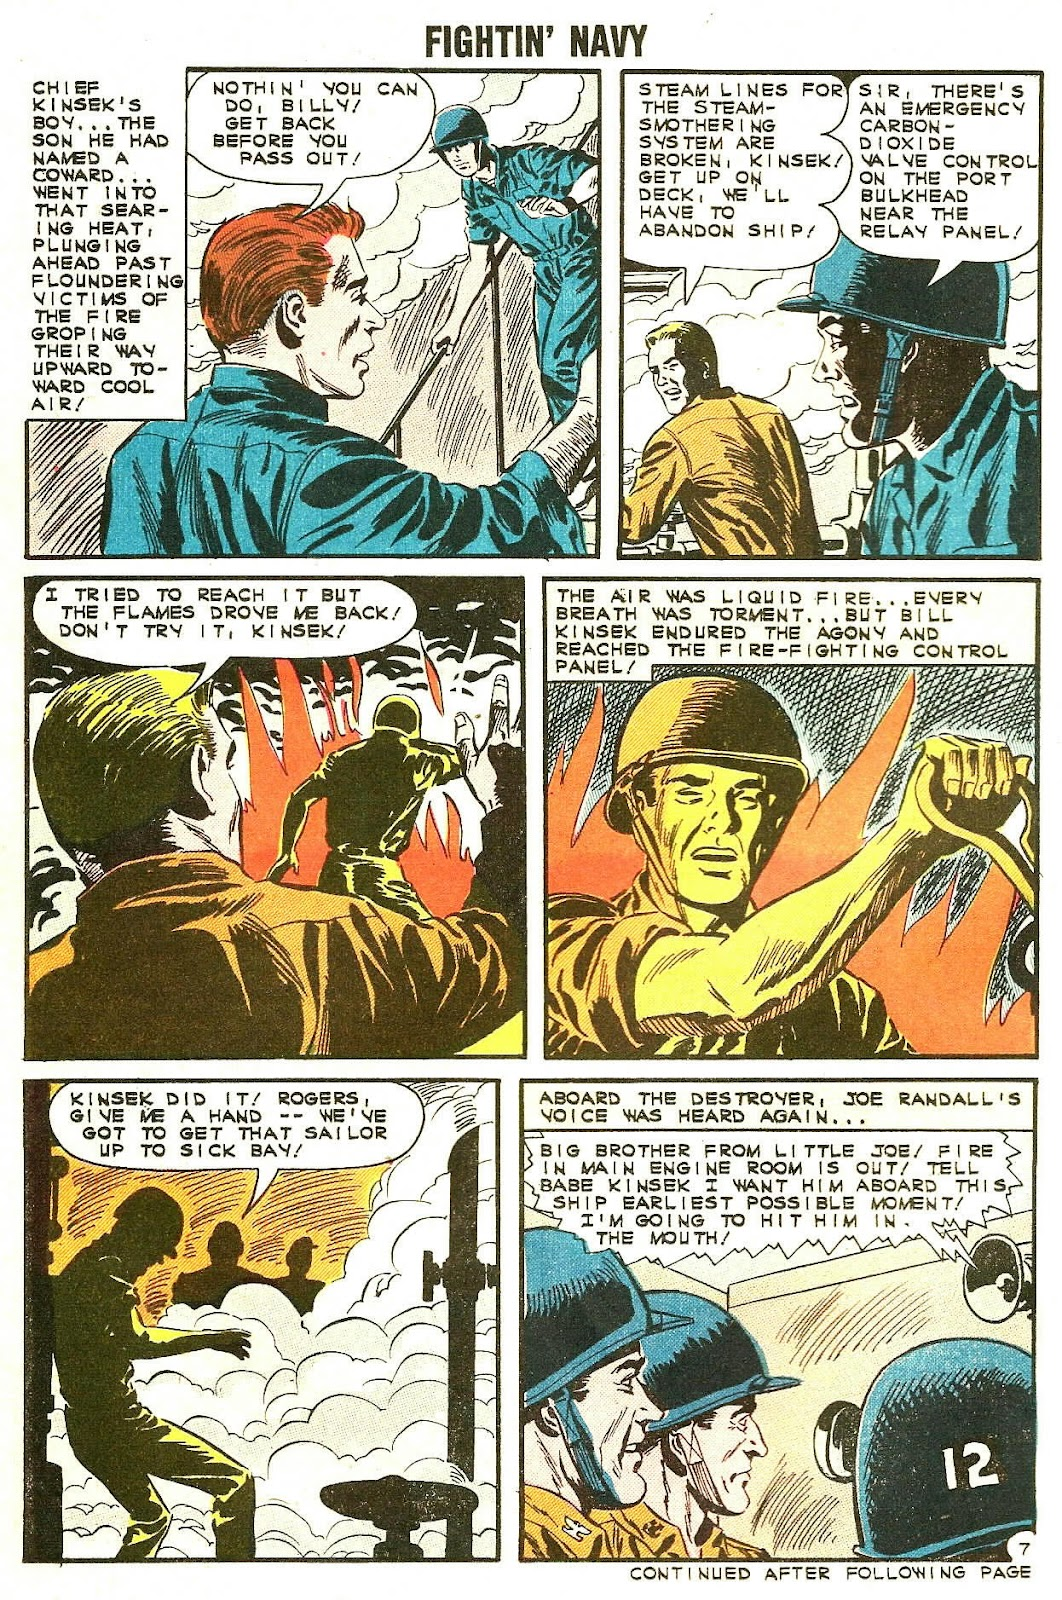 Read online Fightin' Navy comic -  Issue #107 - 14